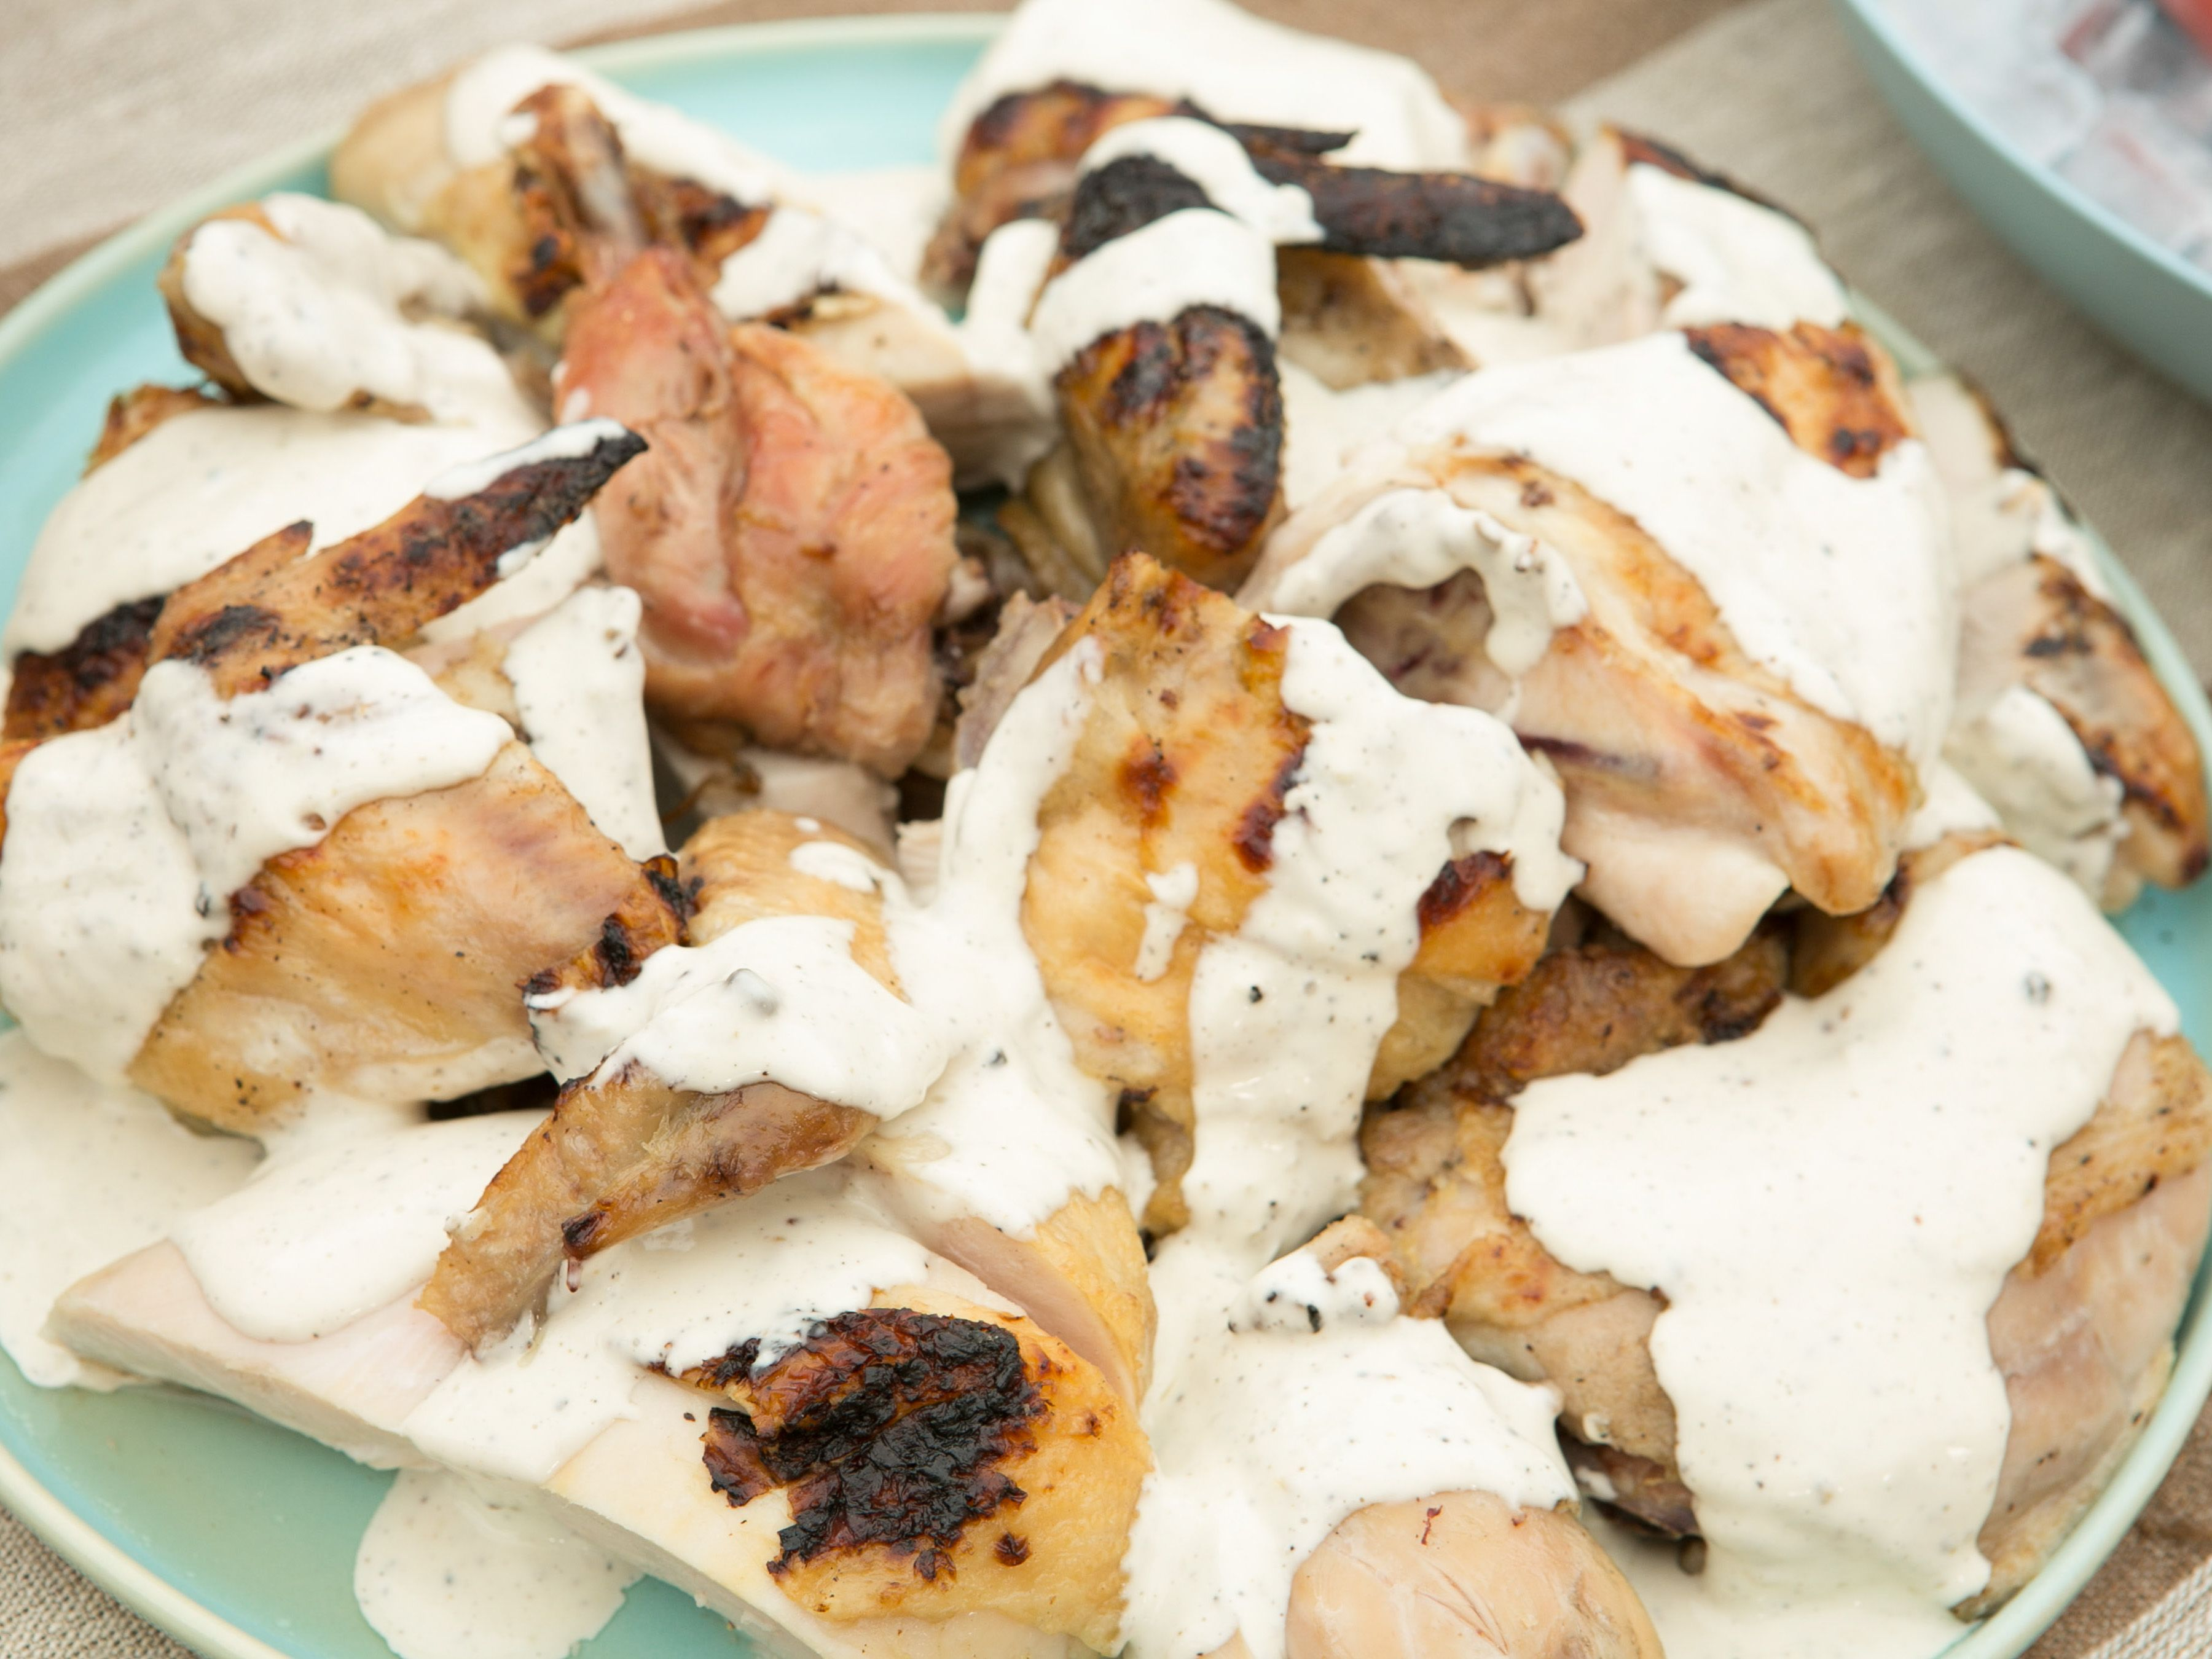 grilled chicken with alabama white bbq sauce rezept chicken cluck cluck yum yum. Black Bedroom Furniture Sets. Home Design Ideas